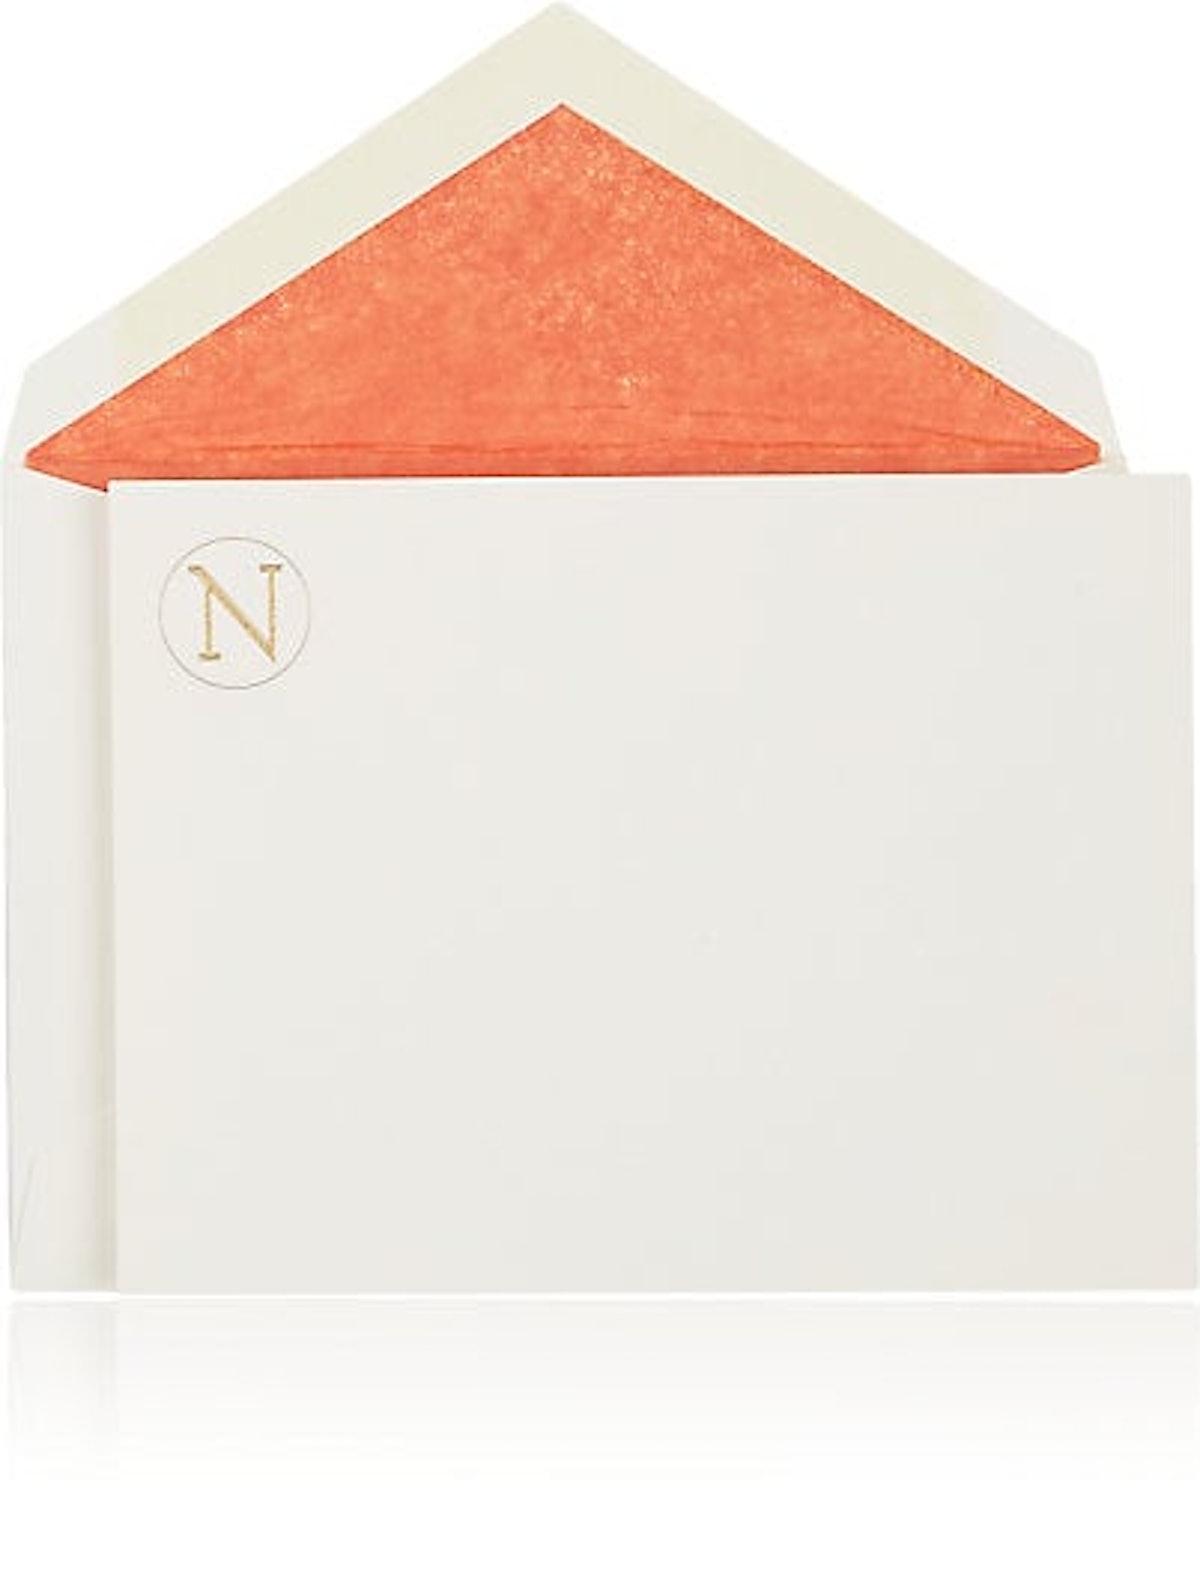 Connor Monogrammed Notecard Set